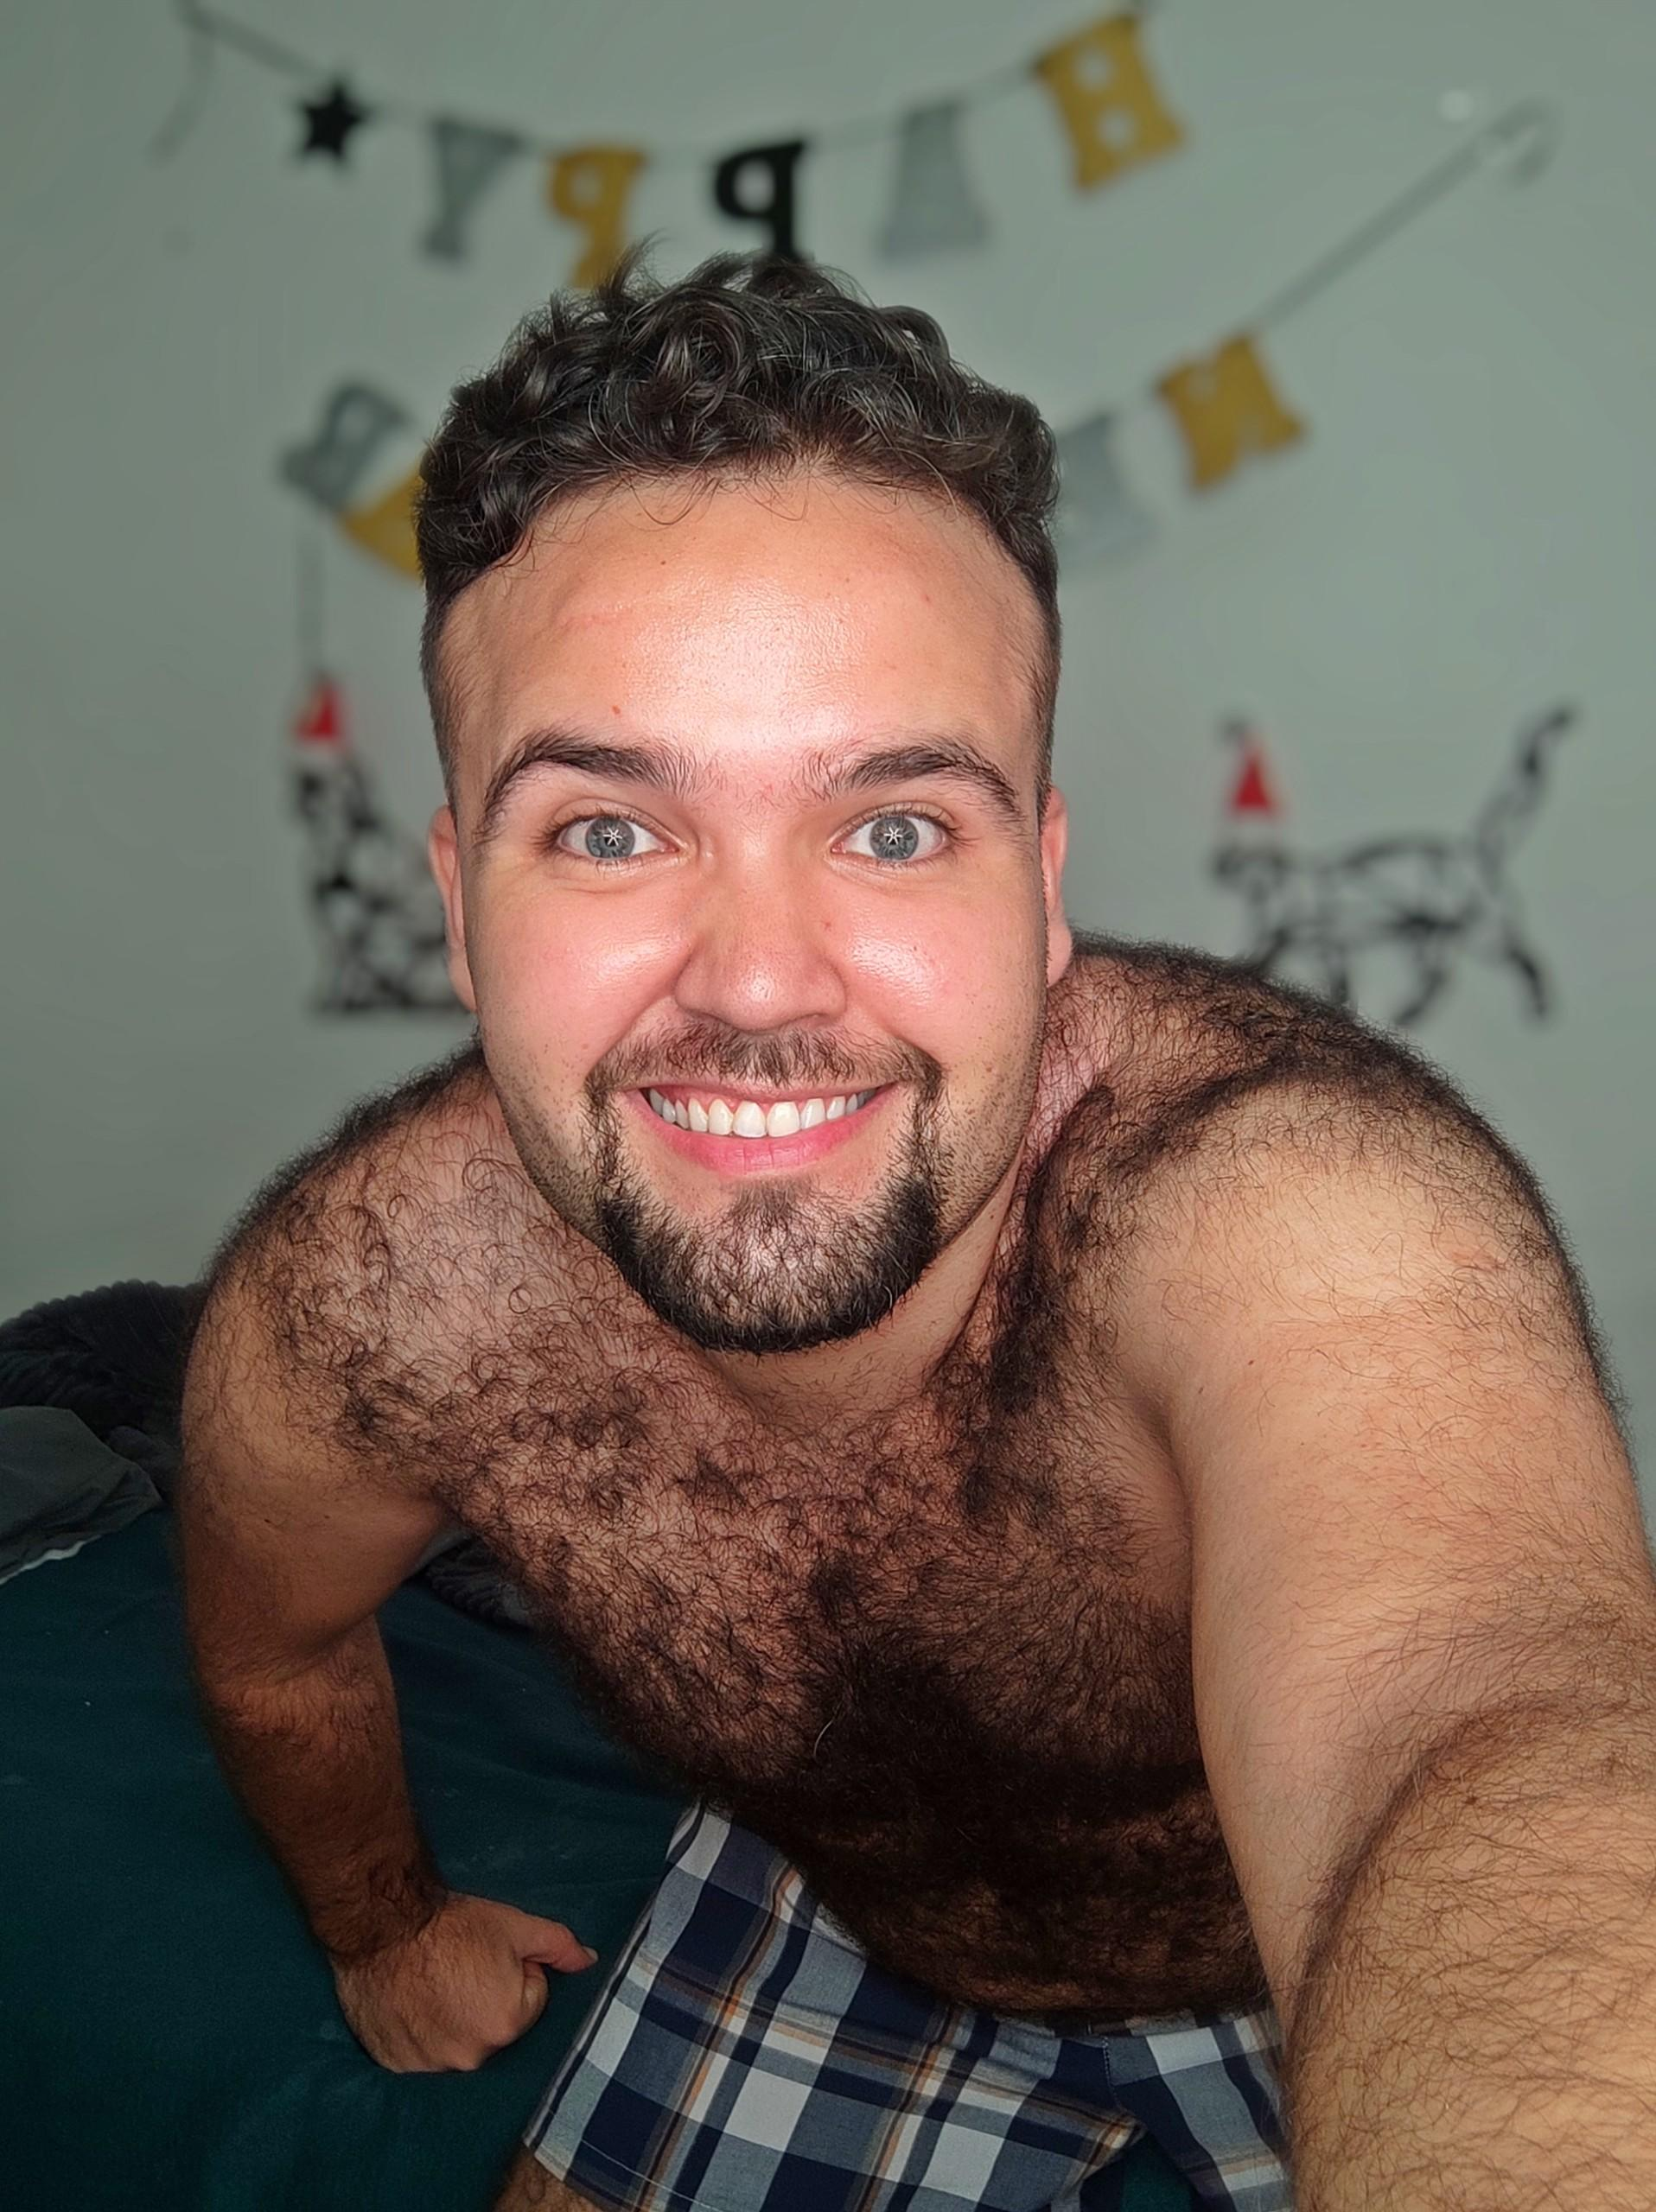 Werewolfm?s=umzubximhveh1mqcoiuxxu3cbfnocehz2r8kfdu18i0=